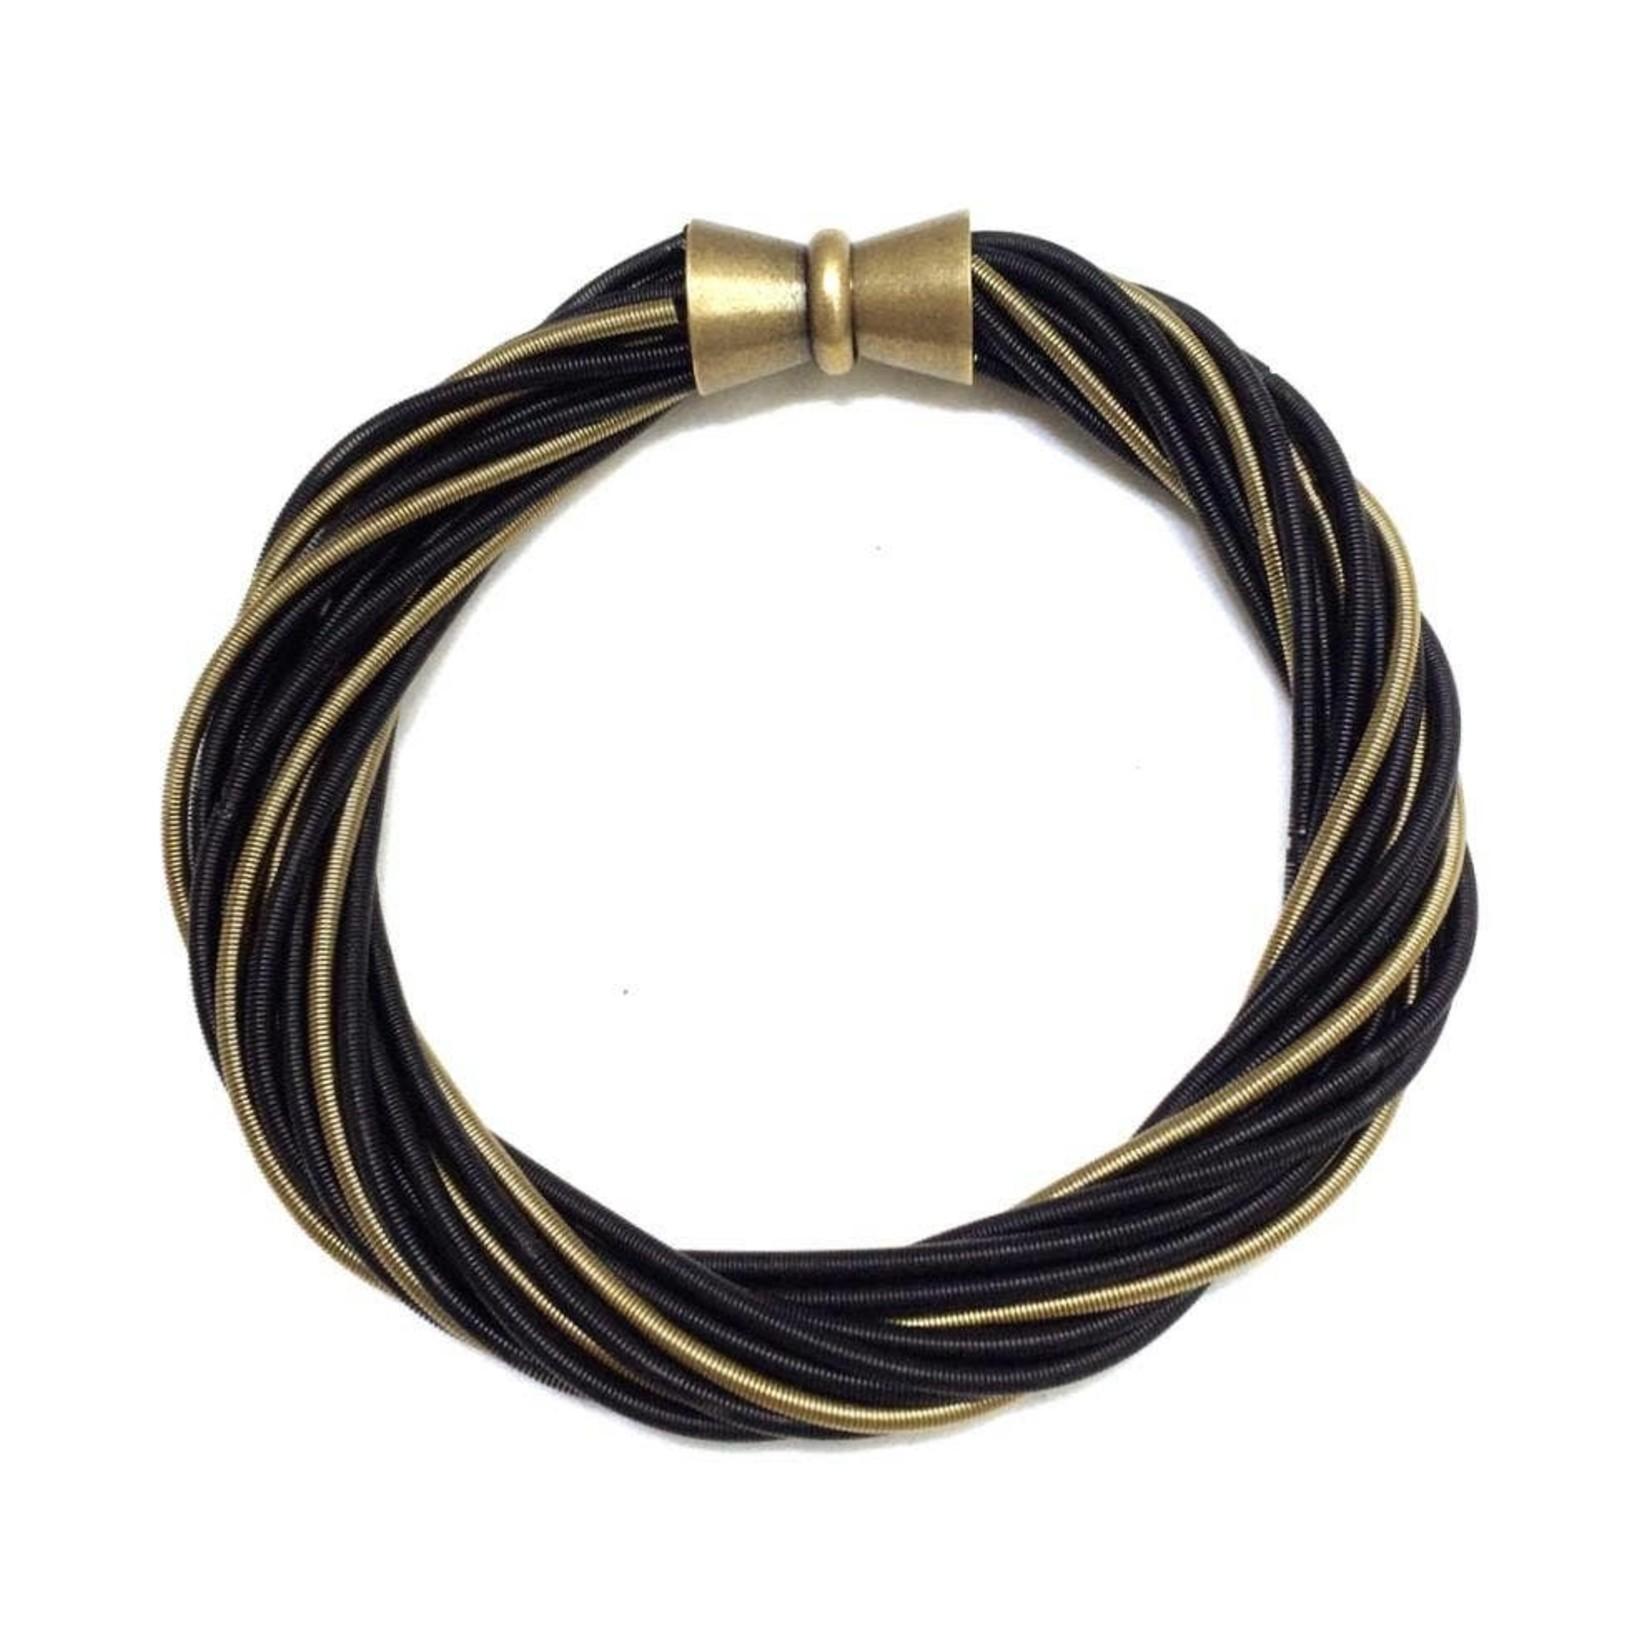 Sea Lily Black/Bronze Twist Bracelet with Magnetic Clasp